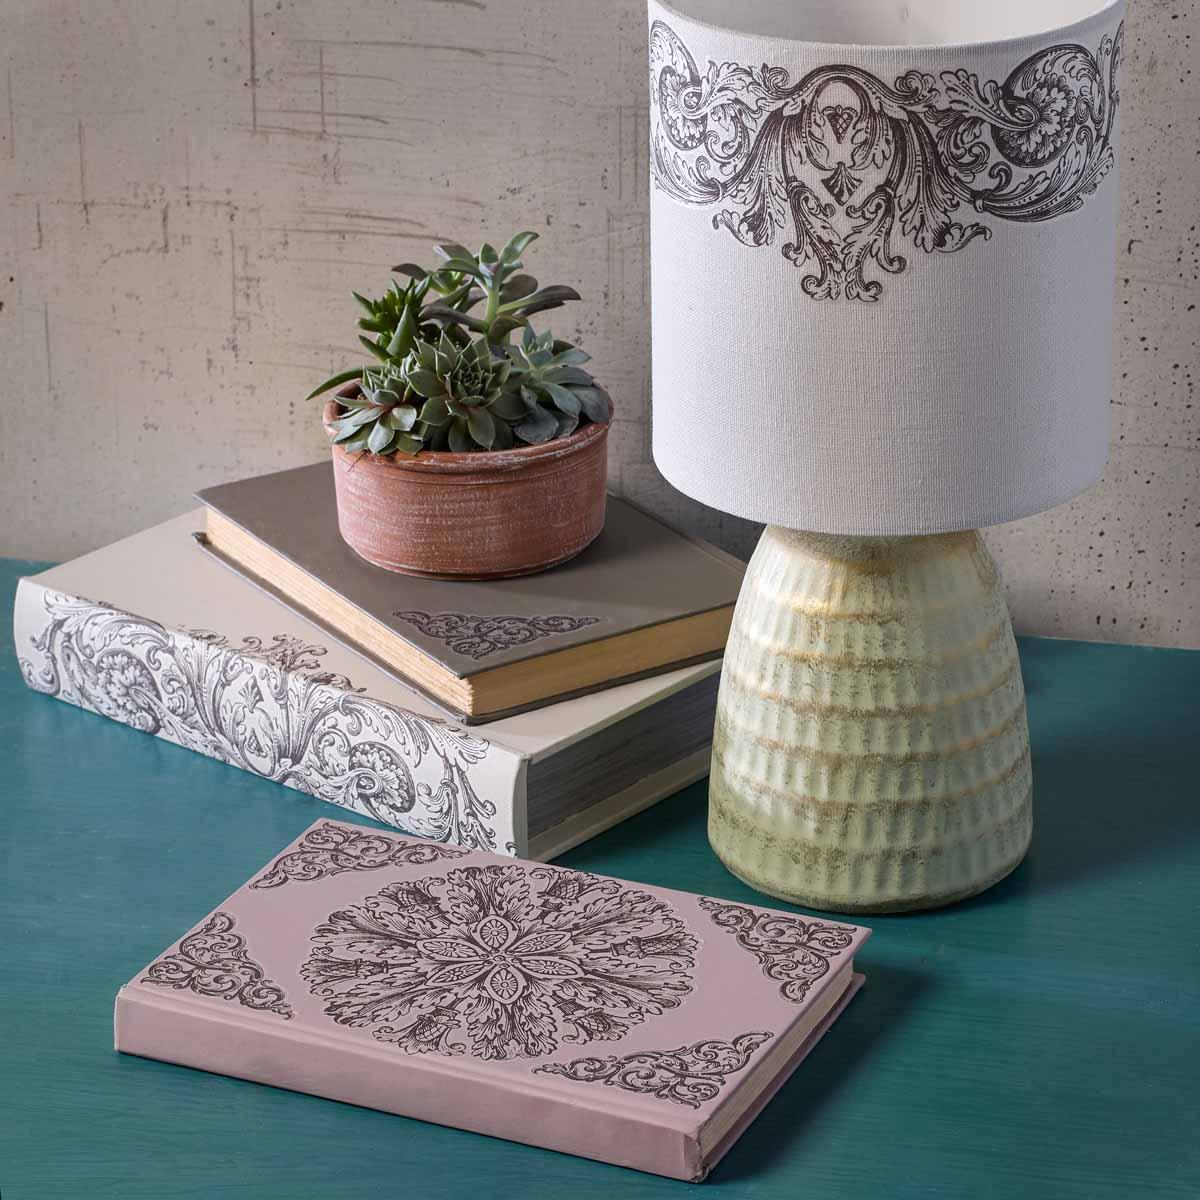 Ornate Lamp, Books, and Garden Pot